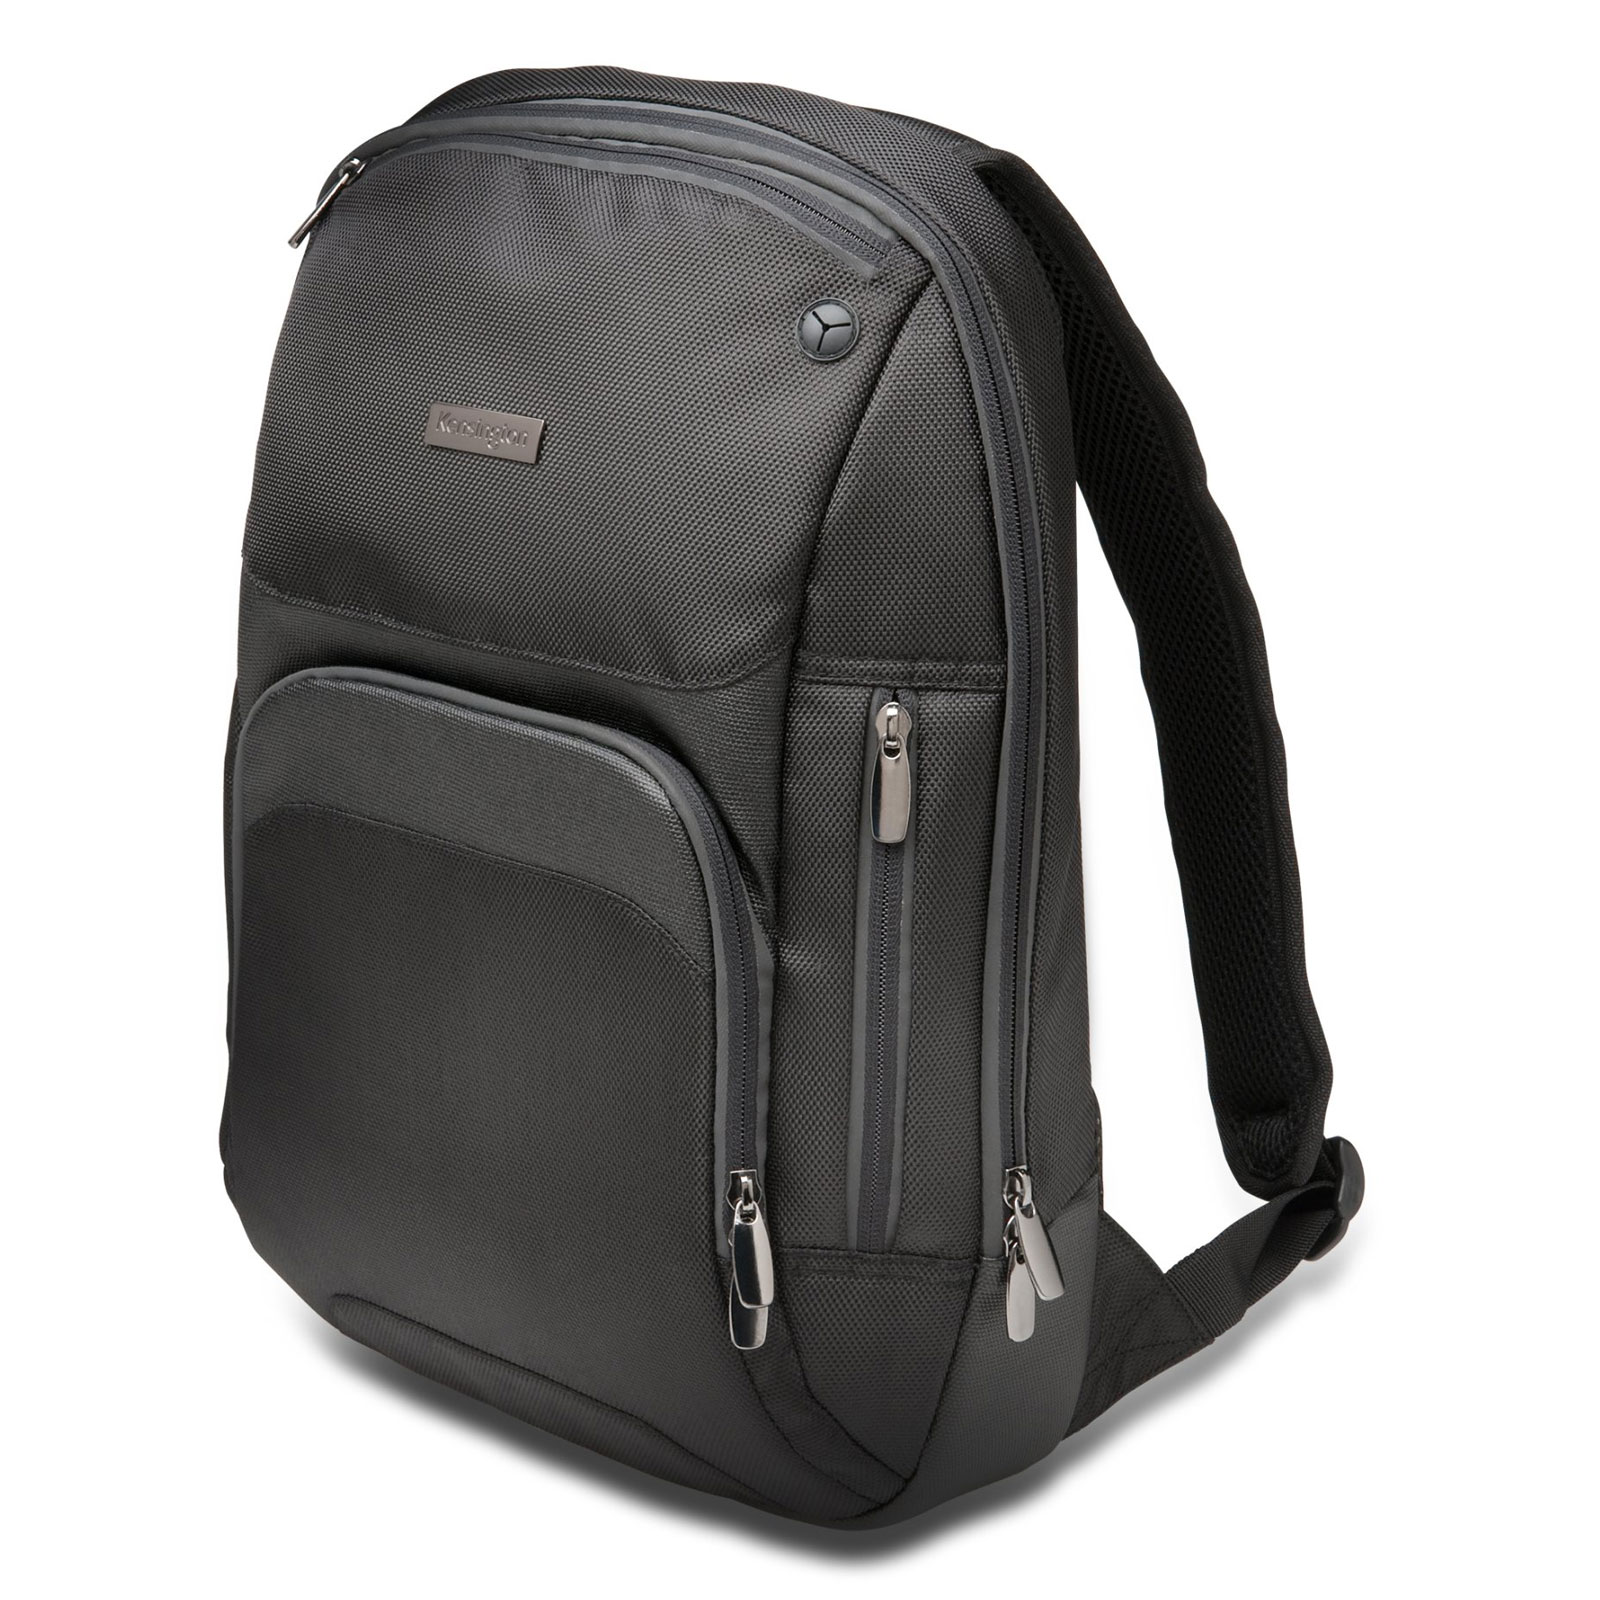 kensington triple trek backpack sac sacoche housse kensington sur. Black Bedroom Furniture Sets. Home Design Ideas